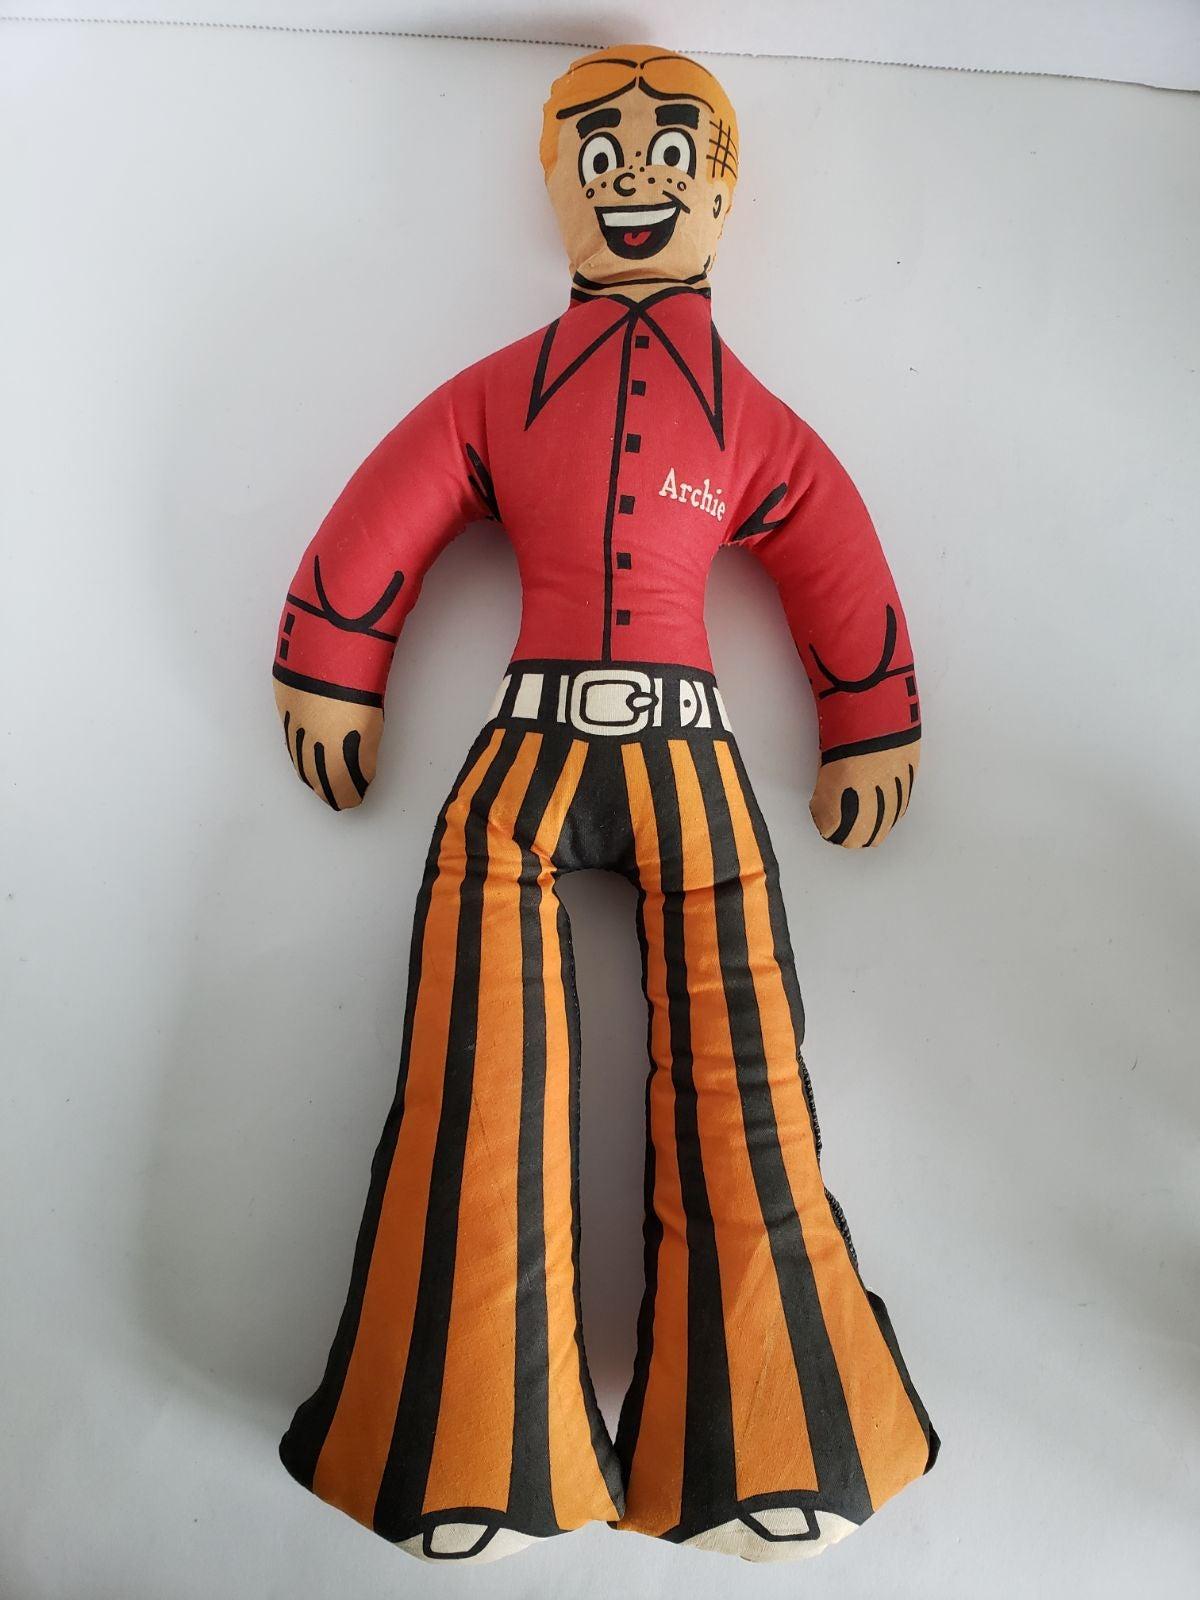 Archie Comics Doll